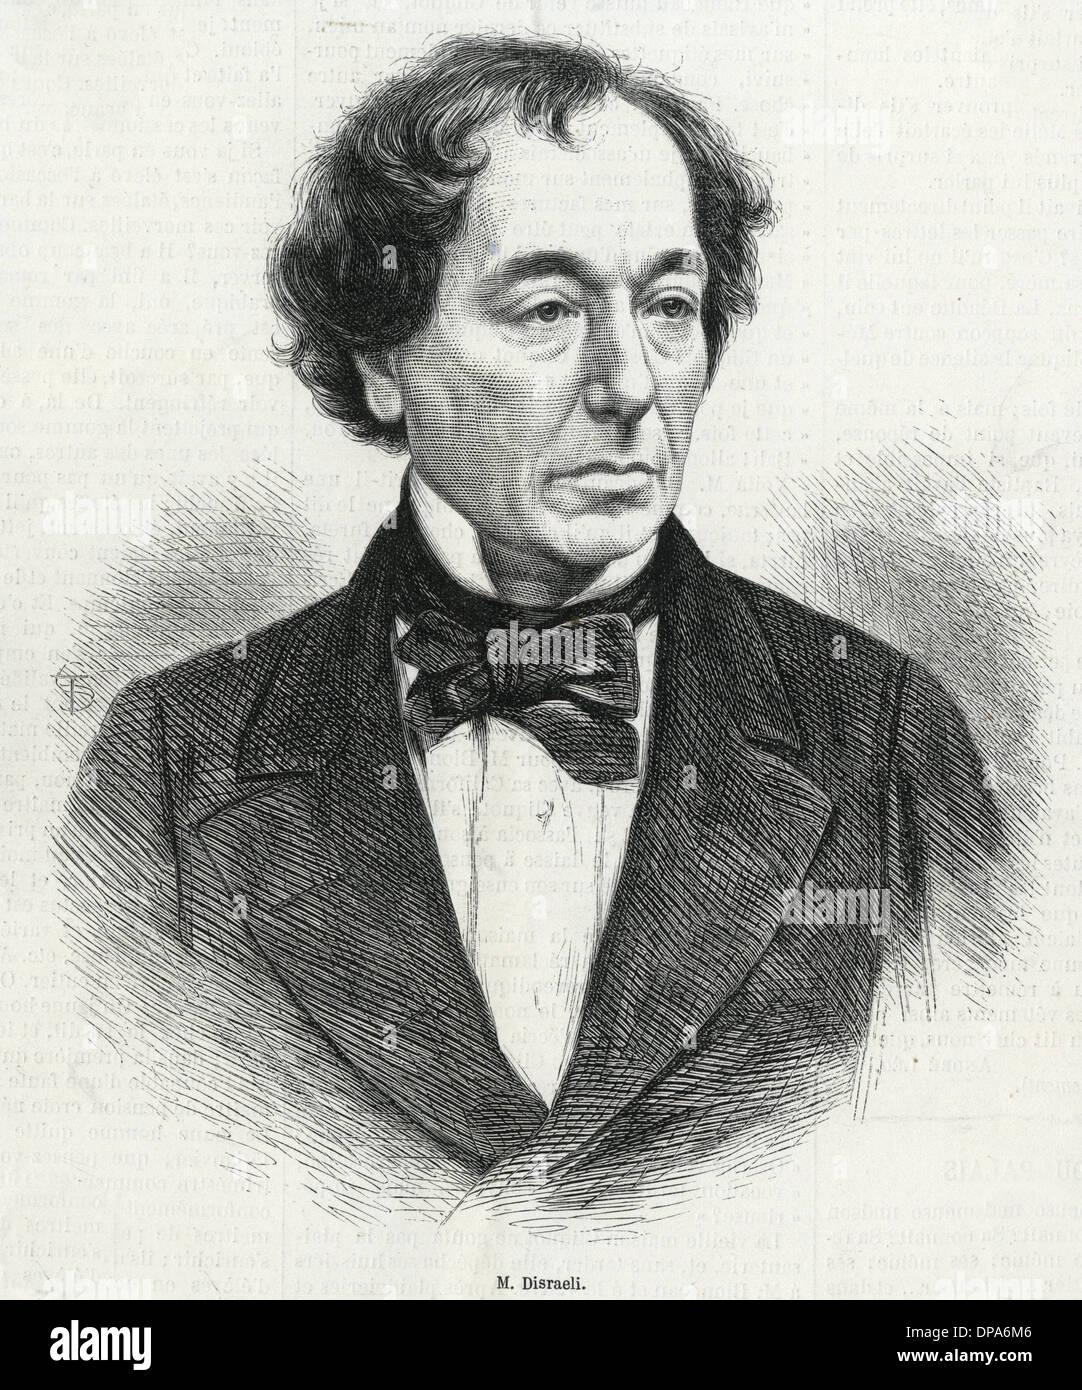 DISRAELI/ILS 1868 - Stock Image